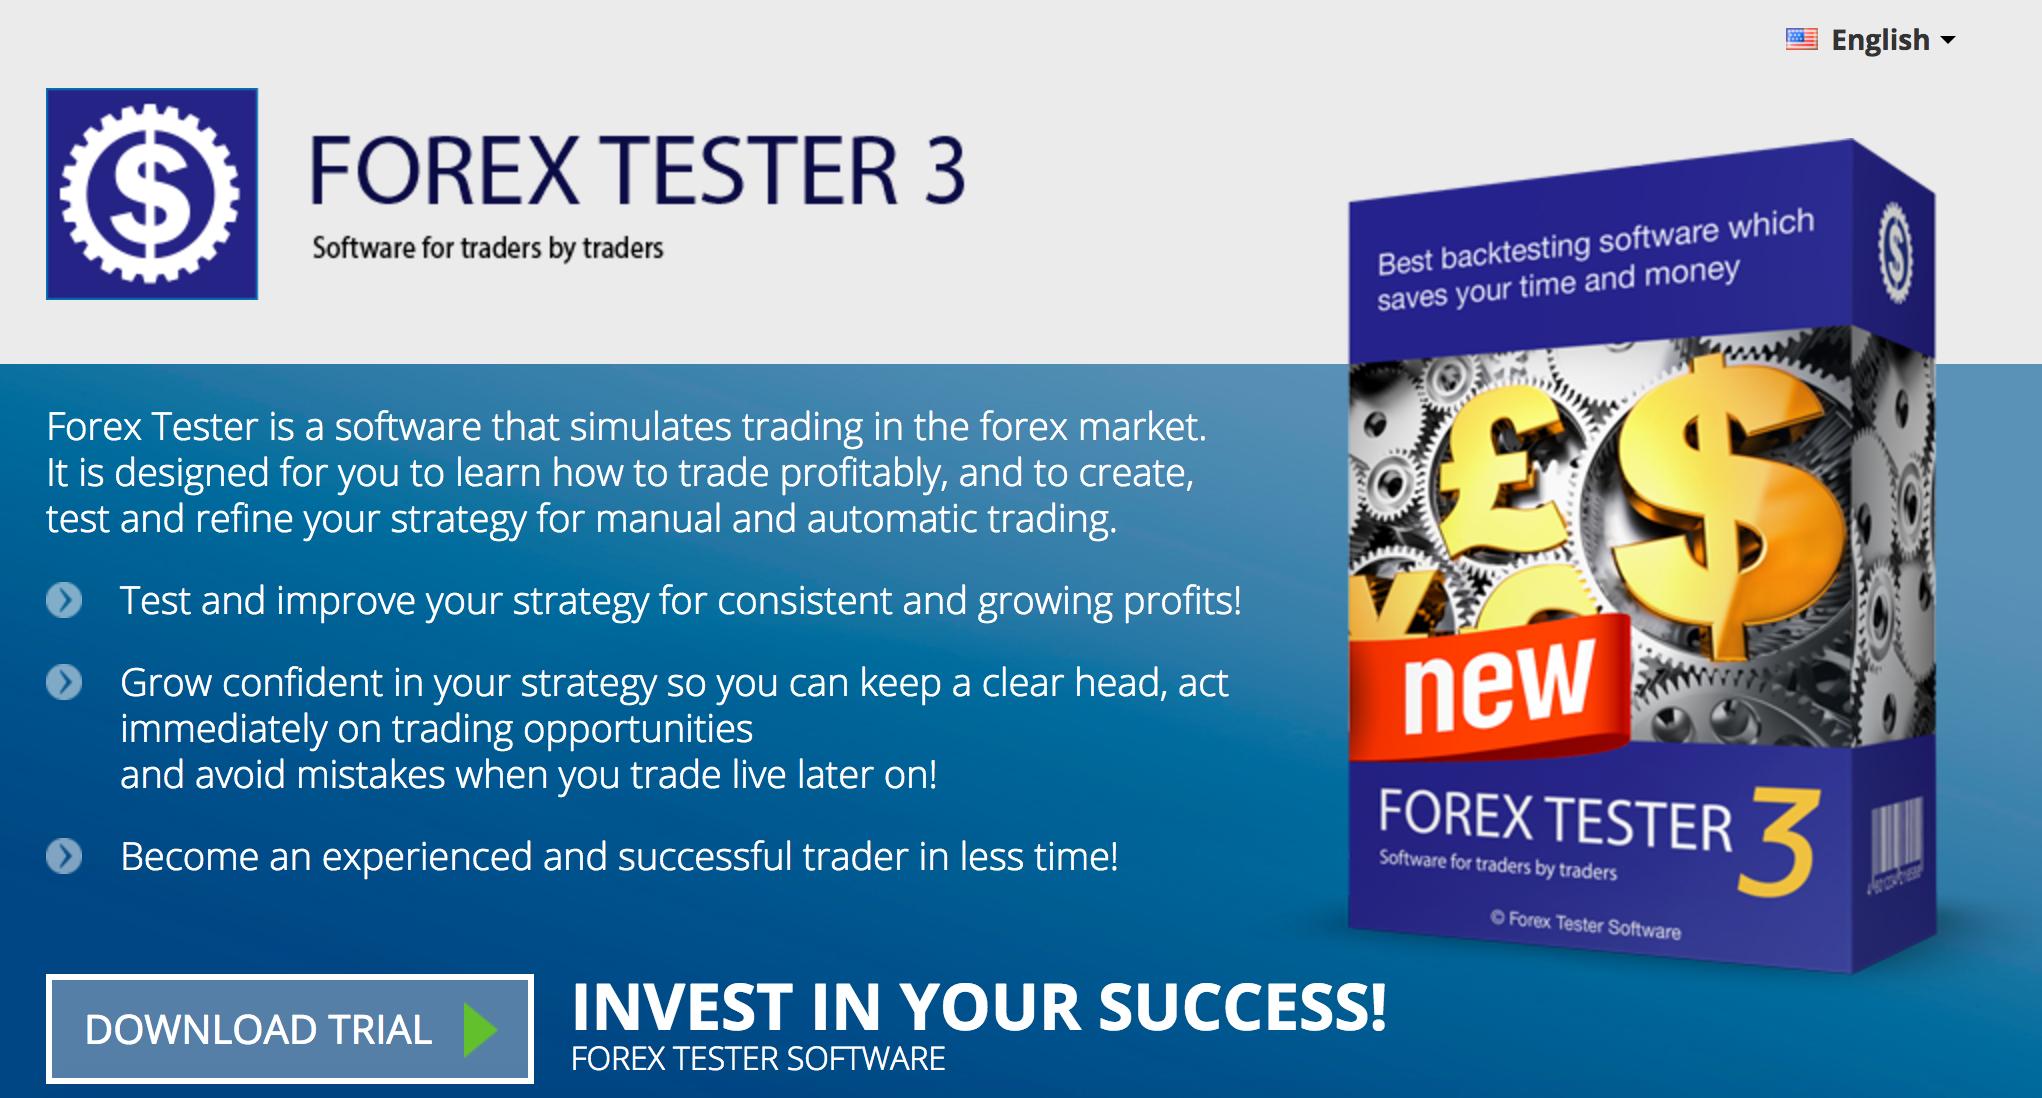 Forex Tester Affiliate Program